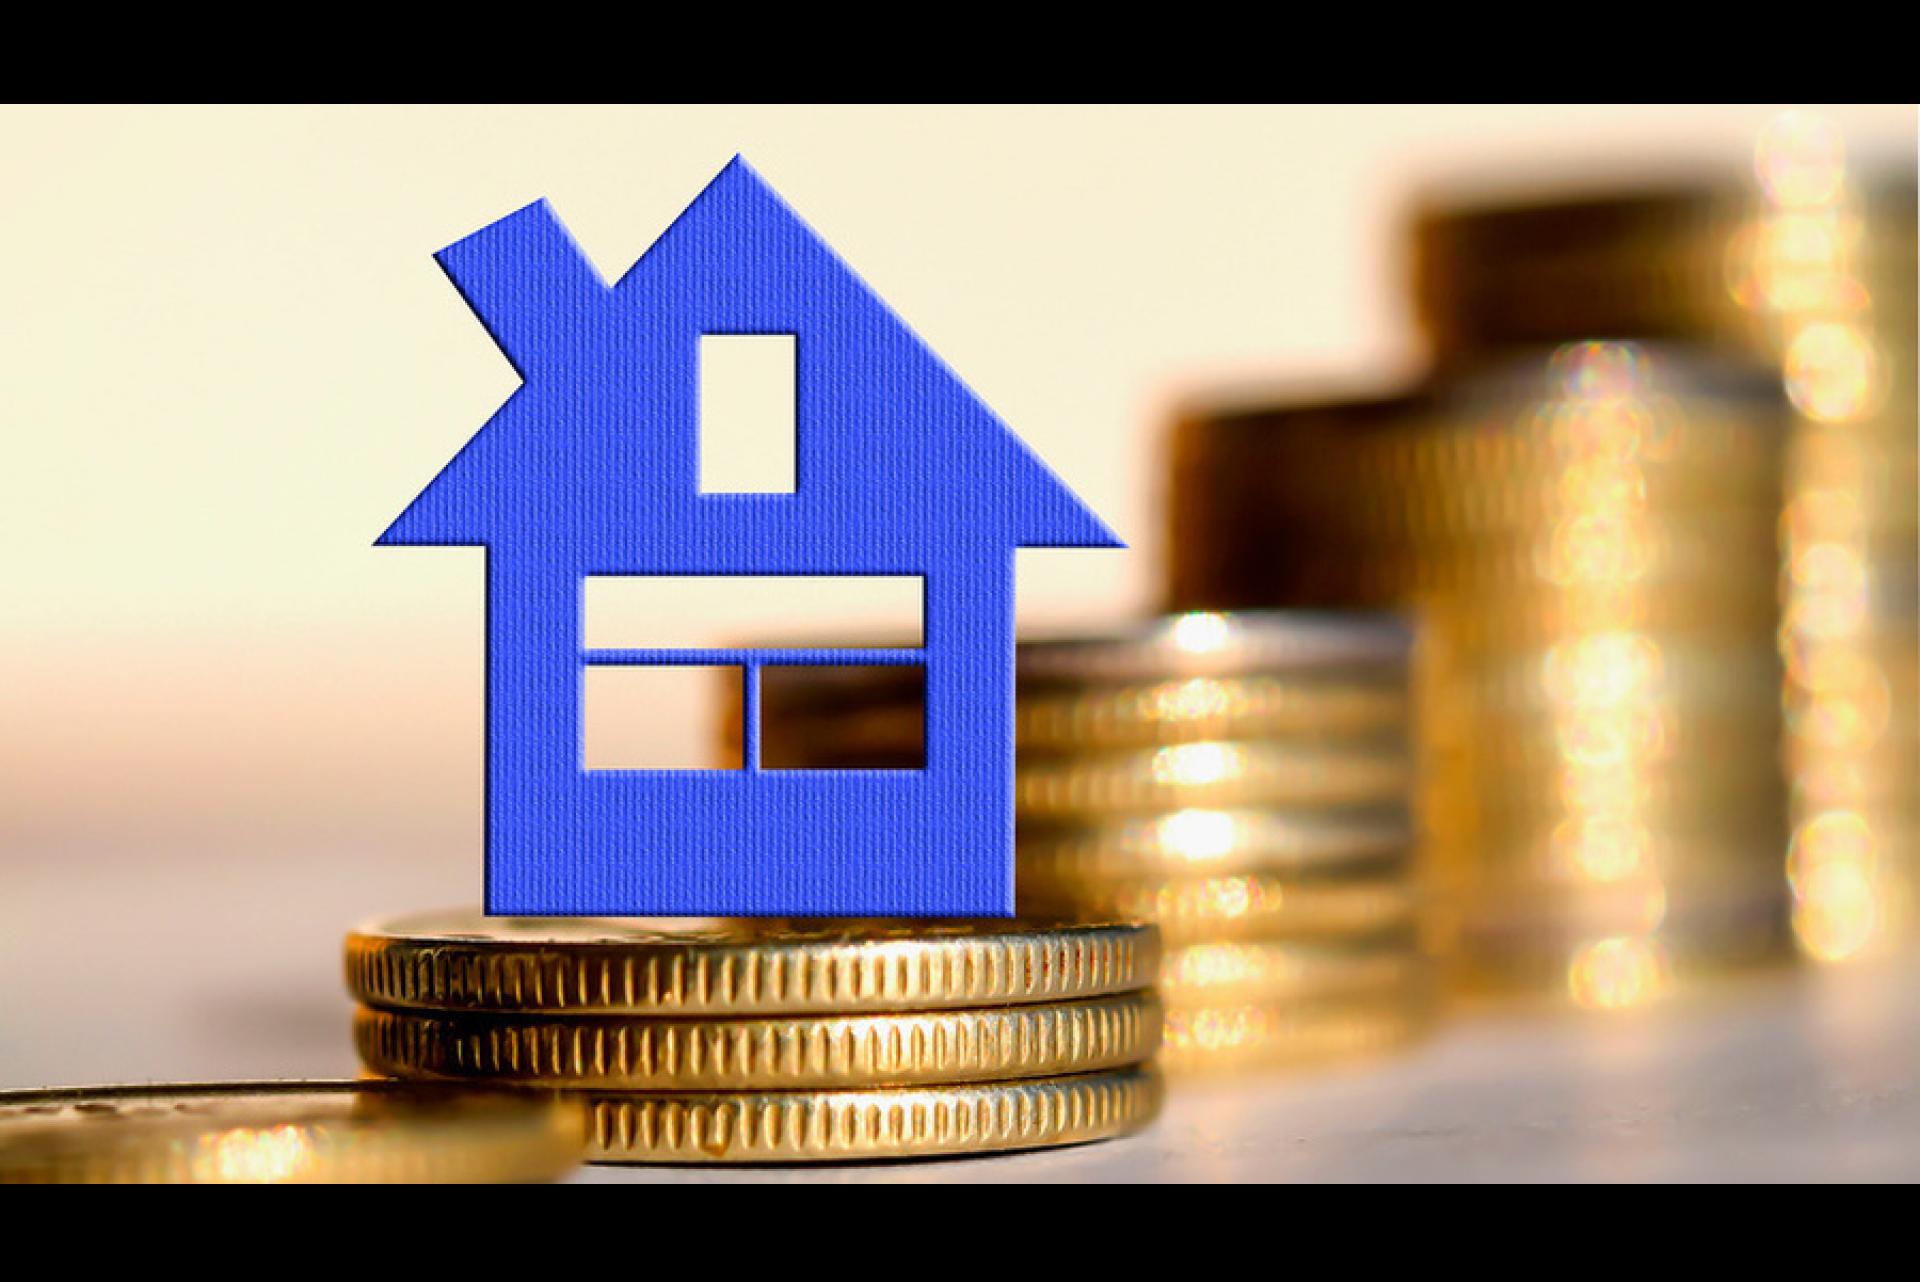 Налог на имущество 2020 году